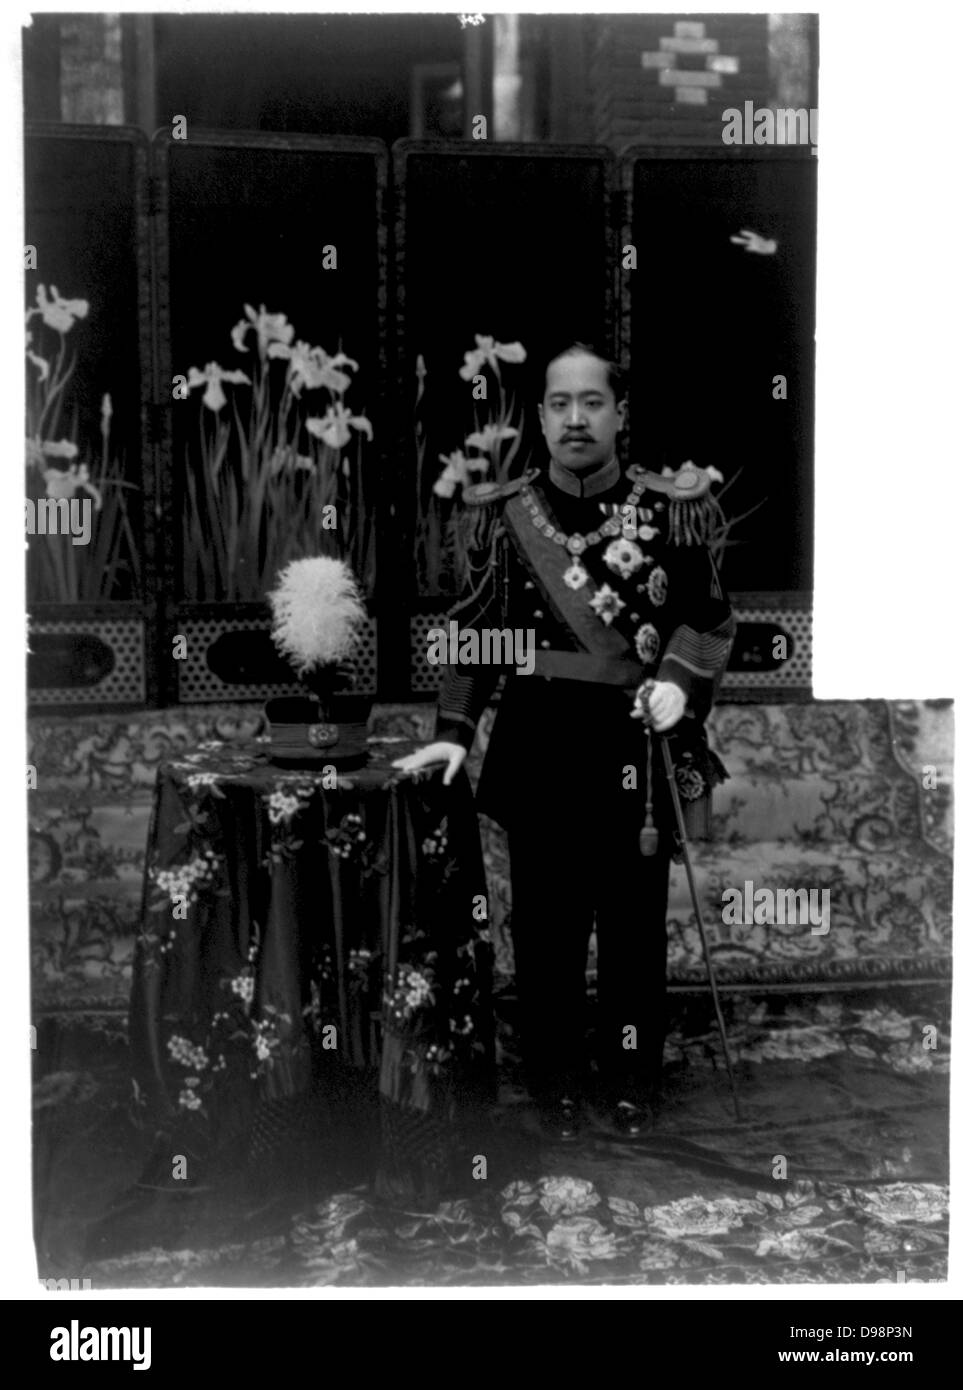 Kojong, Emperor of Korea (1852-1919) in uniform of a Korean general. Full length of Emperor standing beside table. - Stock Image